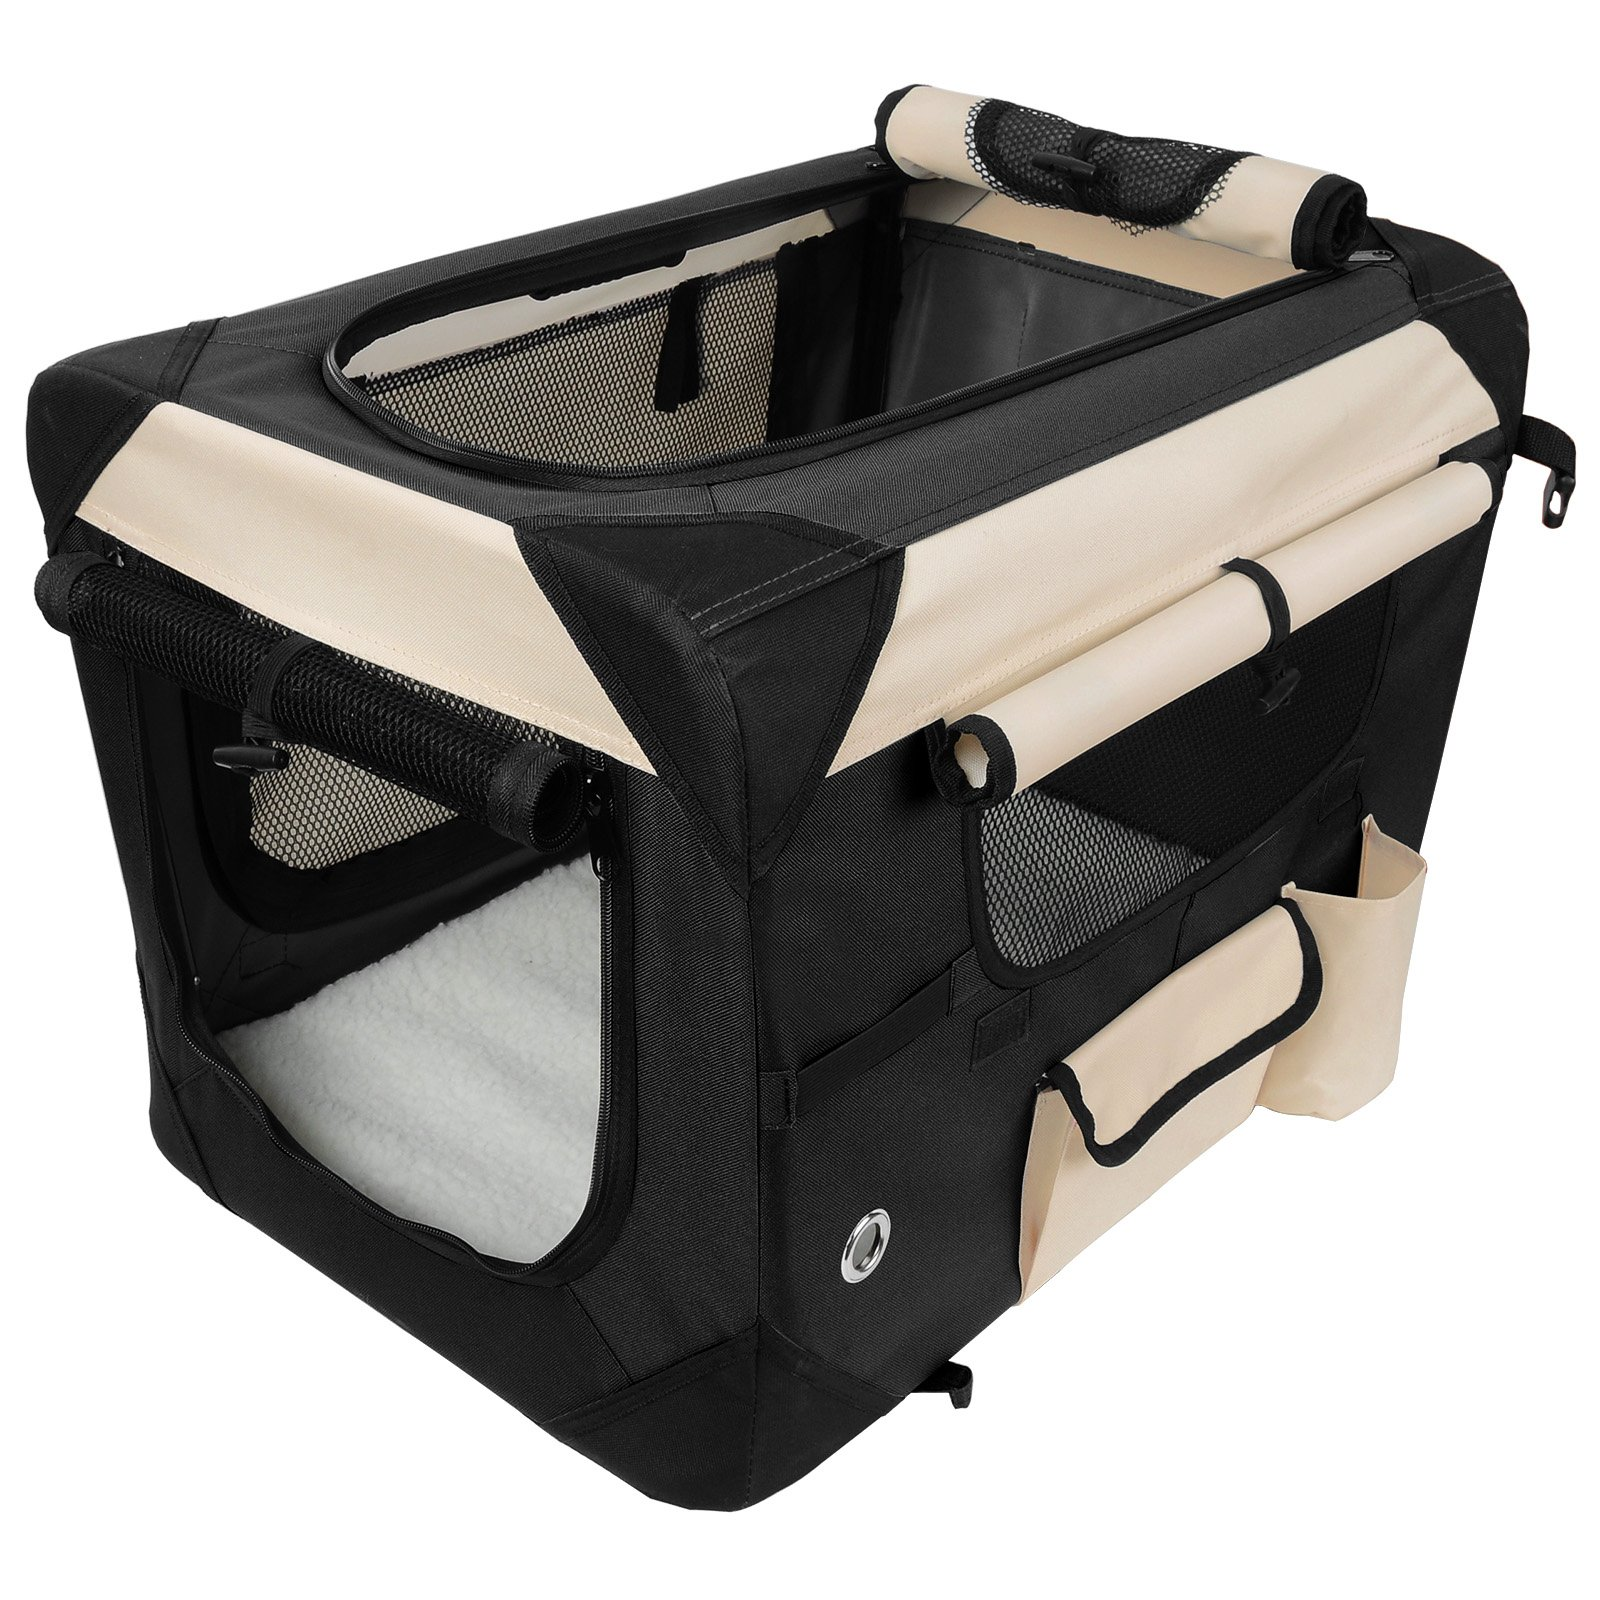 WOLTU Premium Soft Sided Pet Carrier Foldable Pet Travel Crate, Black+Beige, PCS01blkS4-a by WOLTU (Image #3)